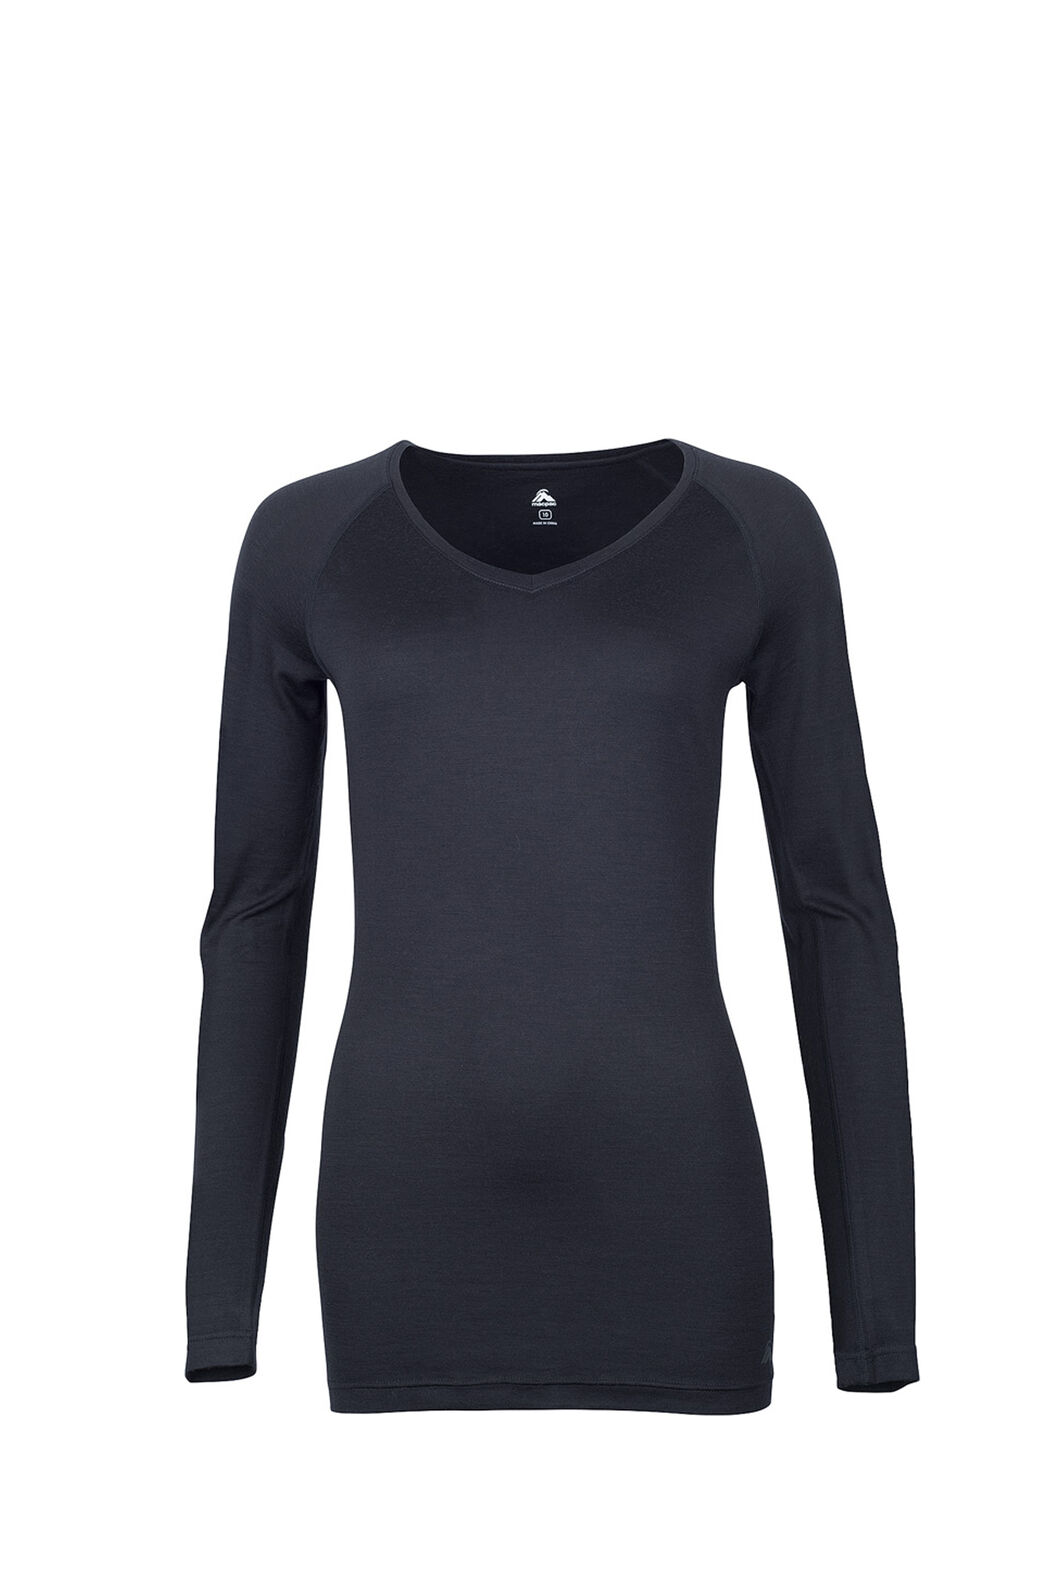 Macpac 150 Merino V-Neck Top — Women's, Black, hi-res